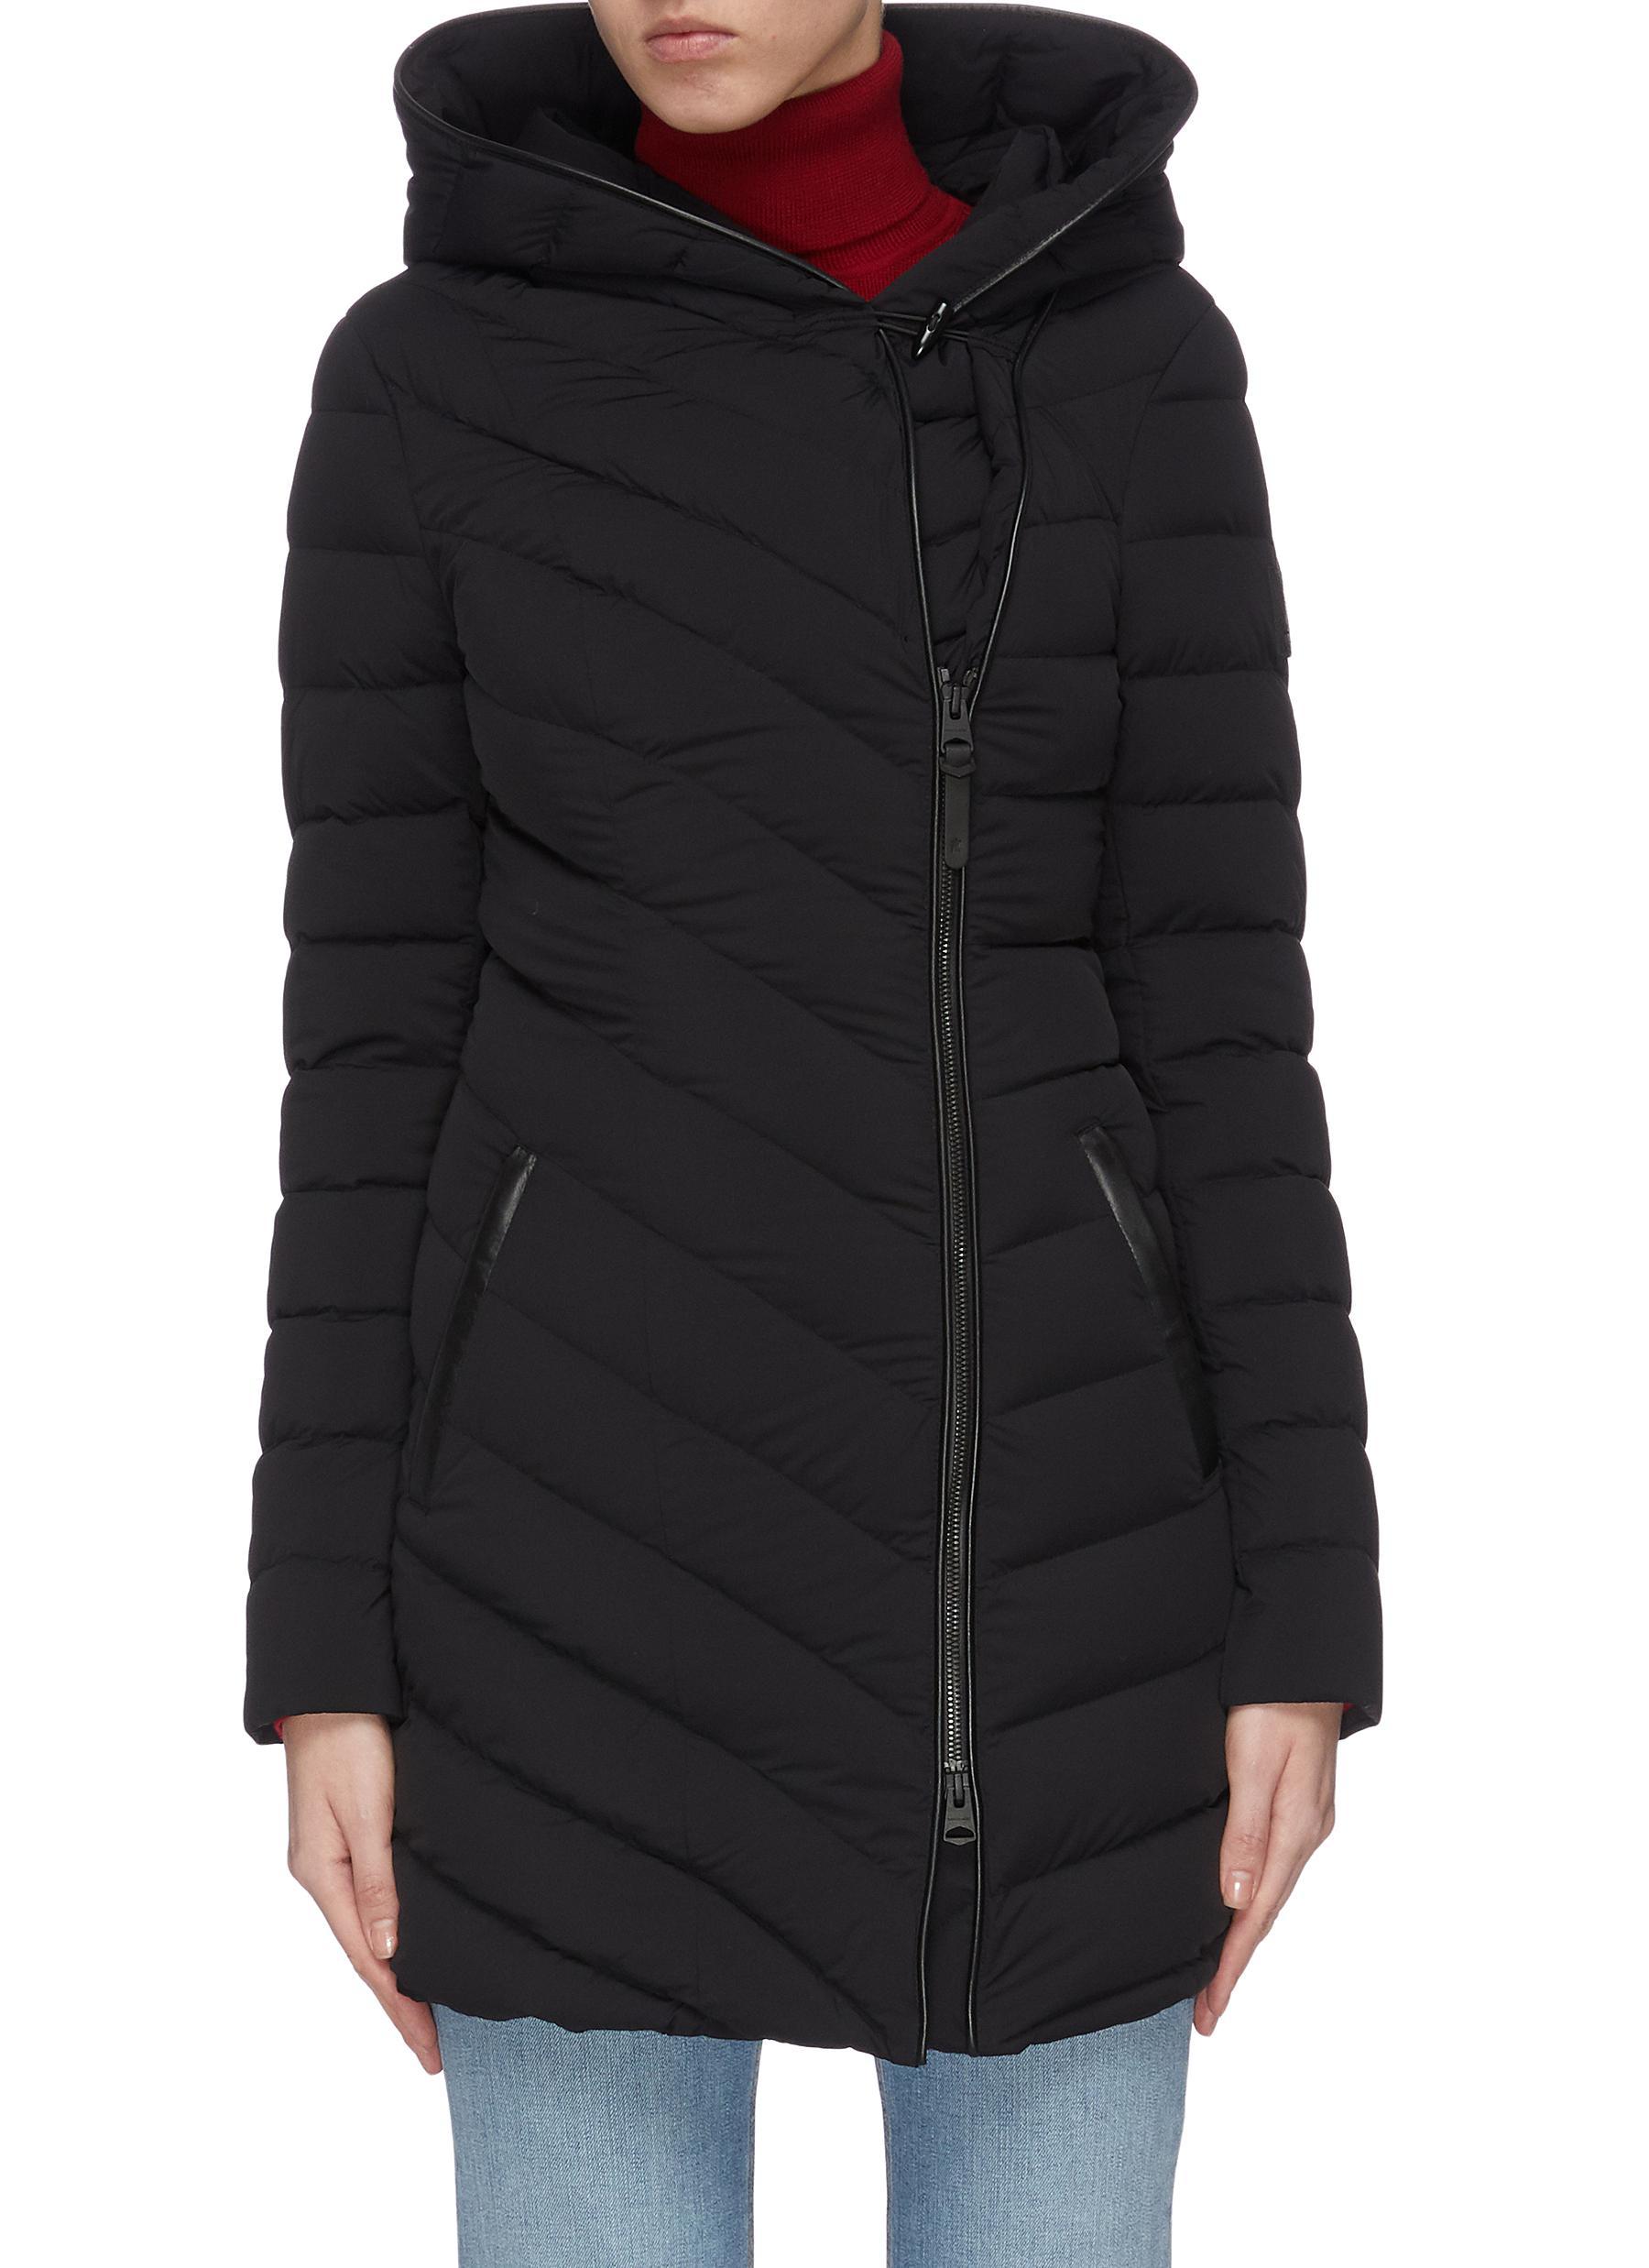 shop Mackage 'Nadine' asymmetric zip hooded puffer jacket online